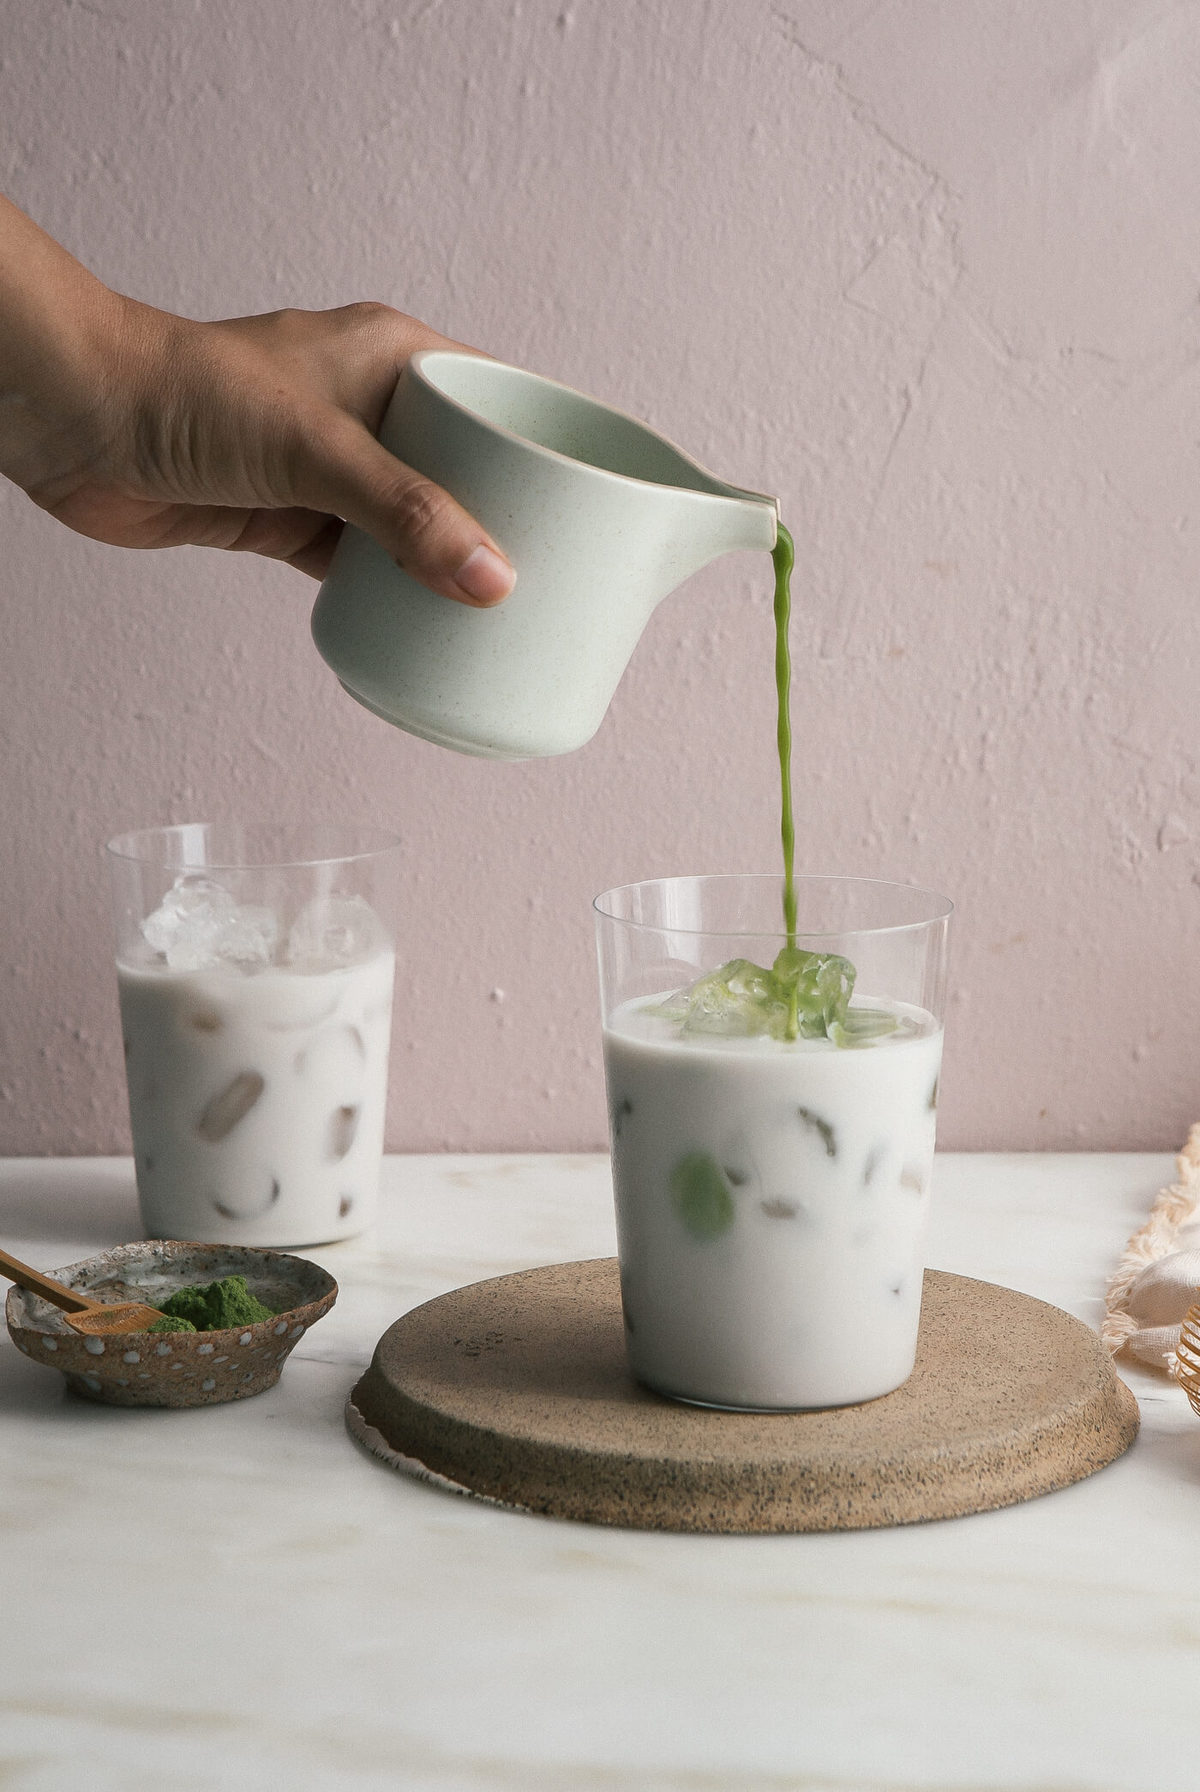 How to Make an Iced Matcha Latte